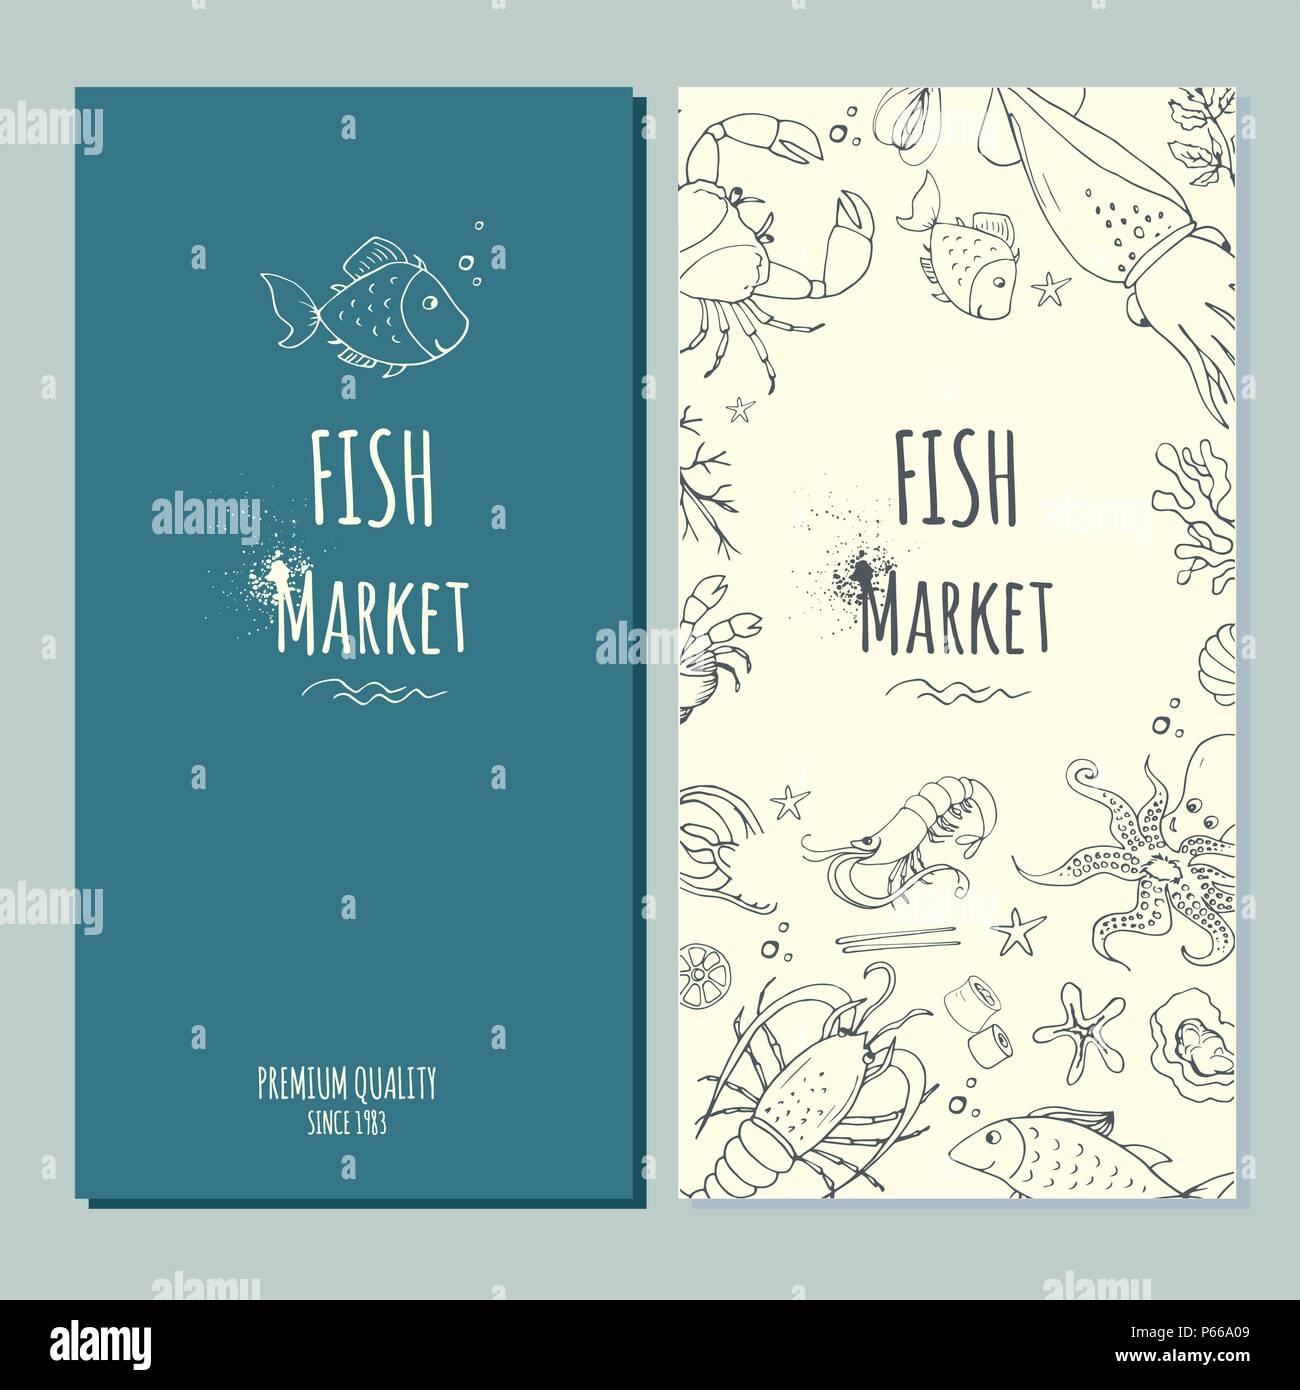 Fish fresh market banner,stock vector illustration - Stock Vector